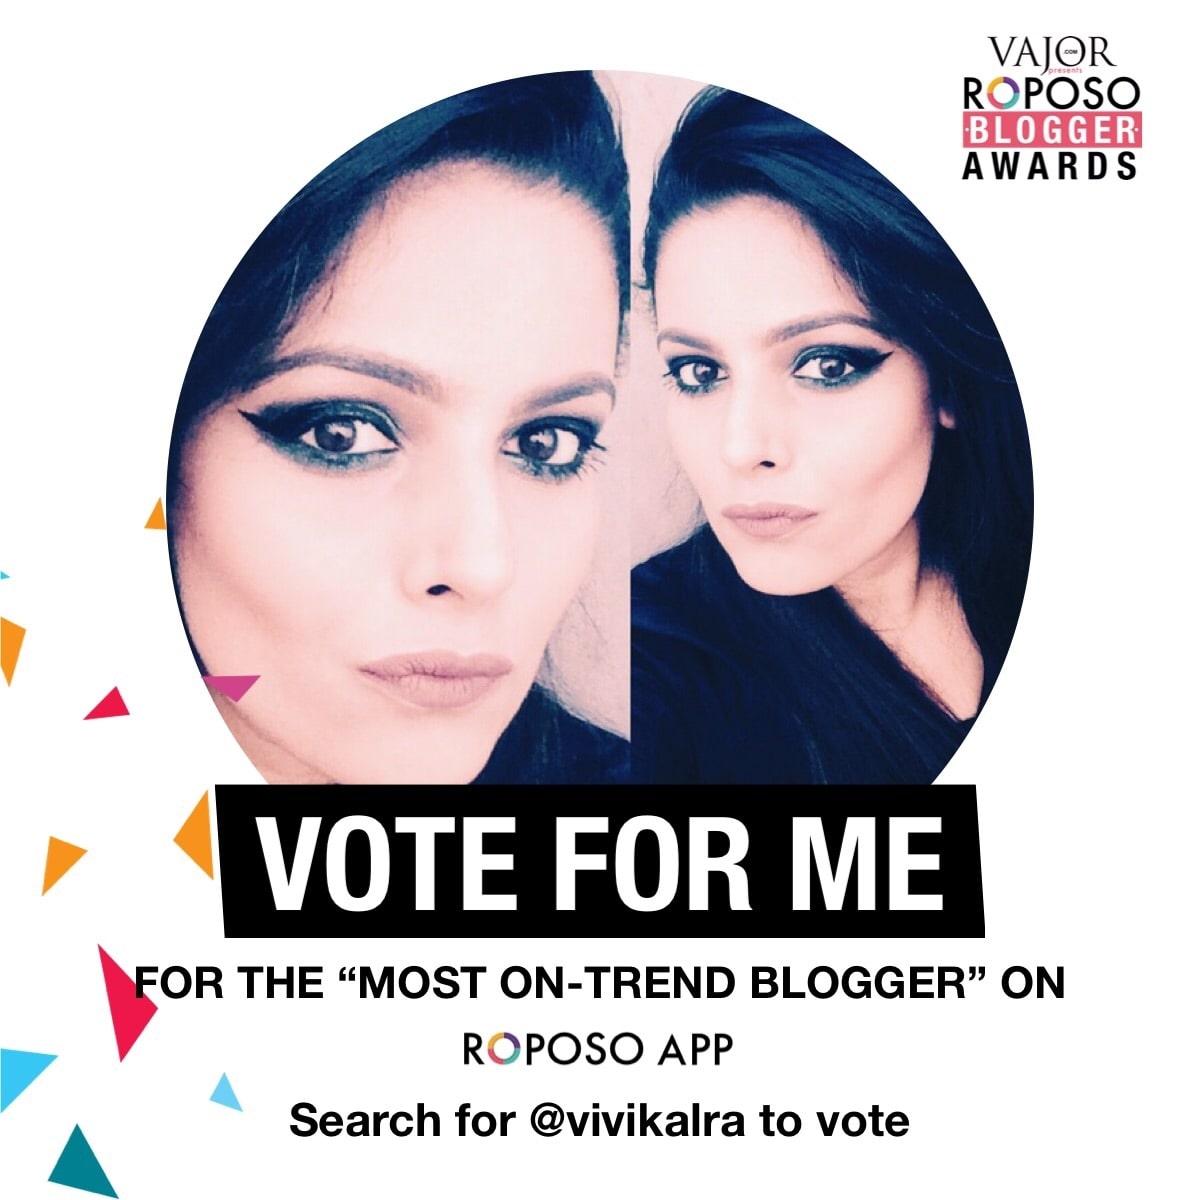 Hello Dolls , Vote for me few days left if you think I deserve please visit my profile and vote for me . Kisses💋 Vivi #soroposo #soroposolove #blogger #vote #voteforme #beautyblogger #beauty #trend #trendy #lifestyle #lifestyleblogger